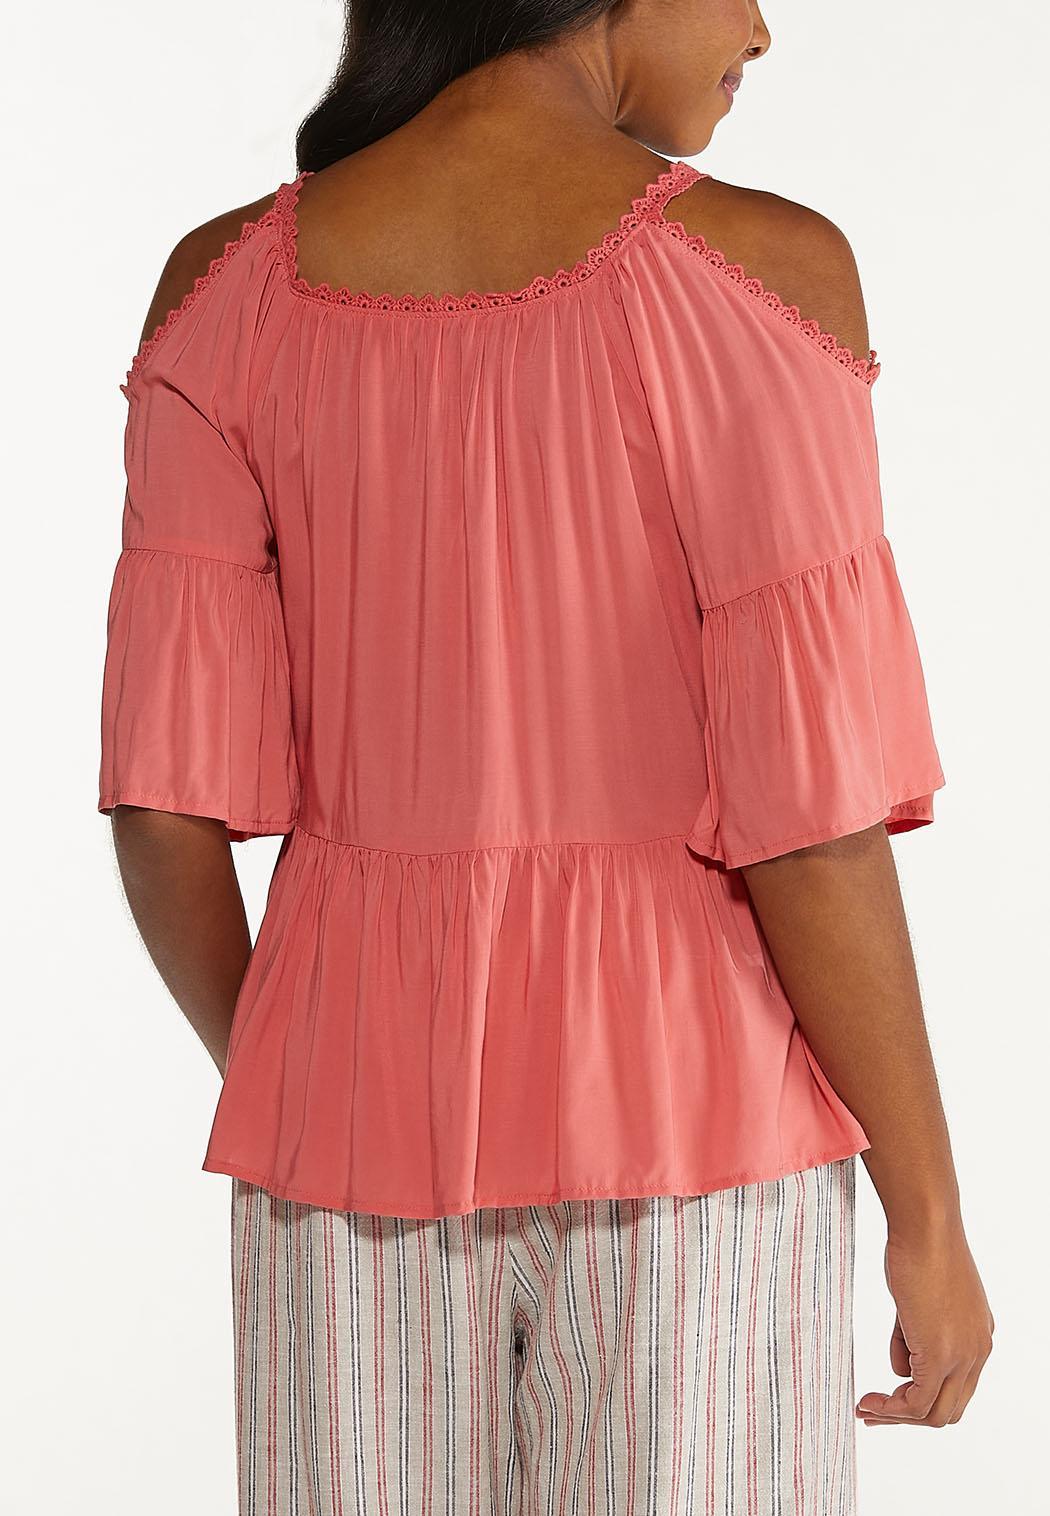 Plus Size Embroidered Cold Shoulder Top (Item #44548117)